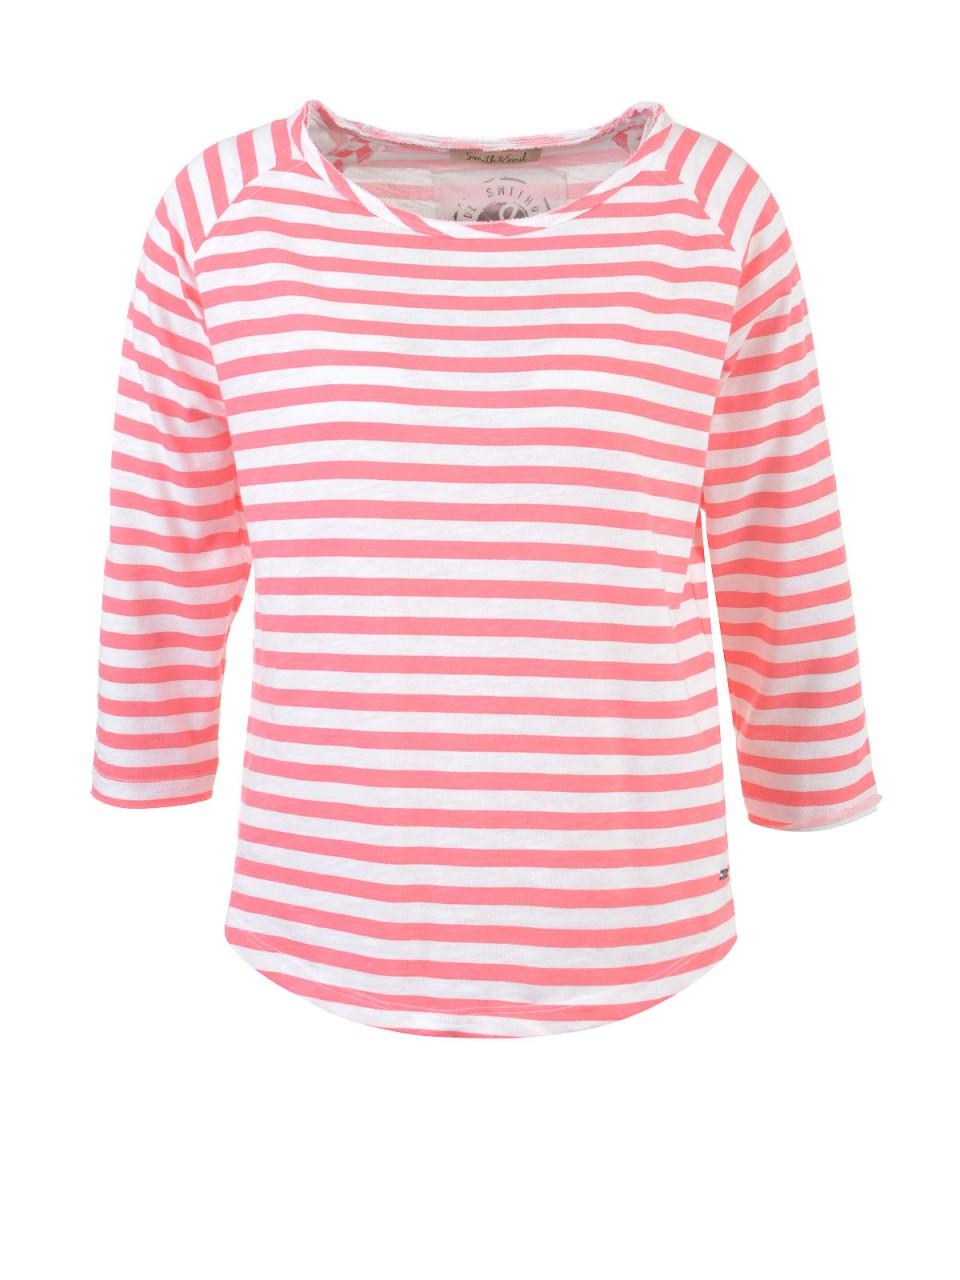 smith-amp-soul-damen-shirt-koralle-wei-szlig-